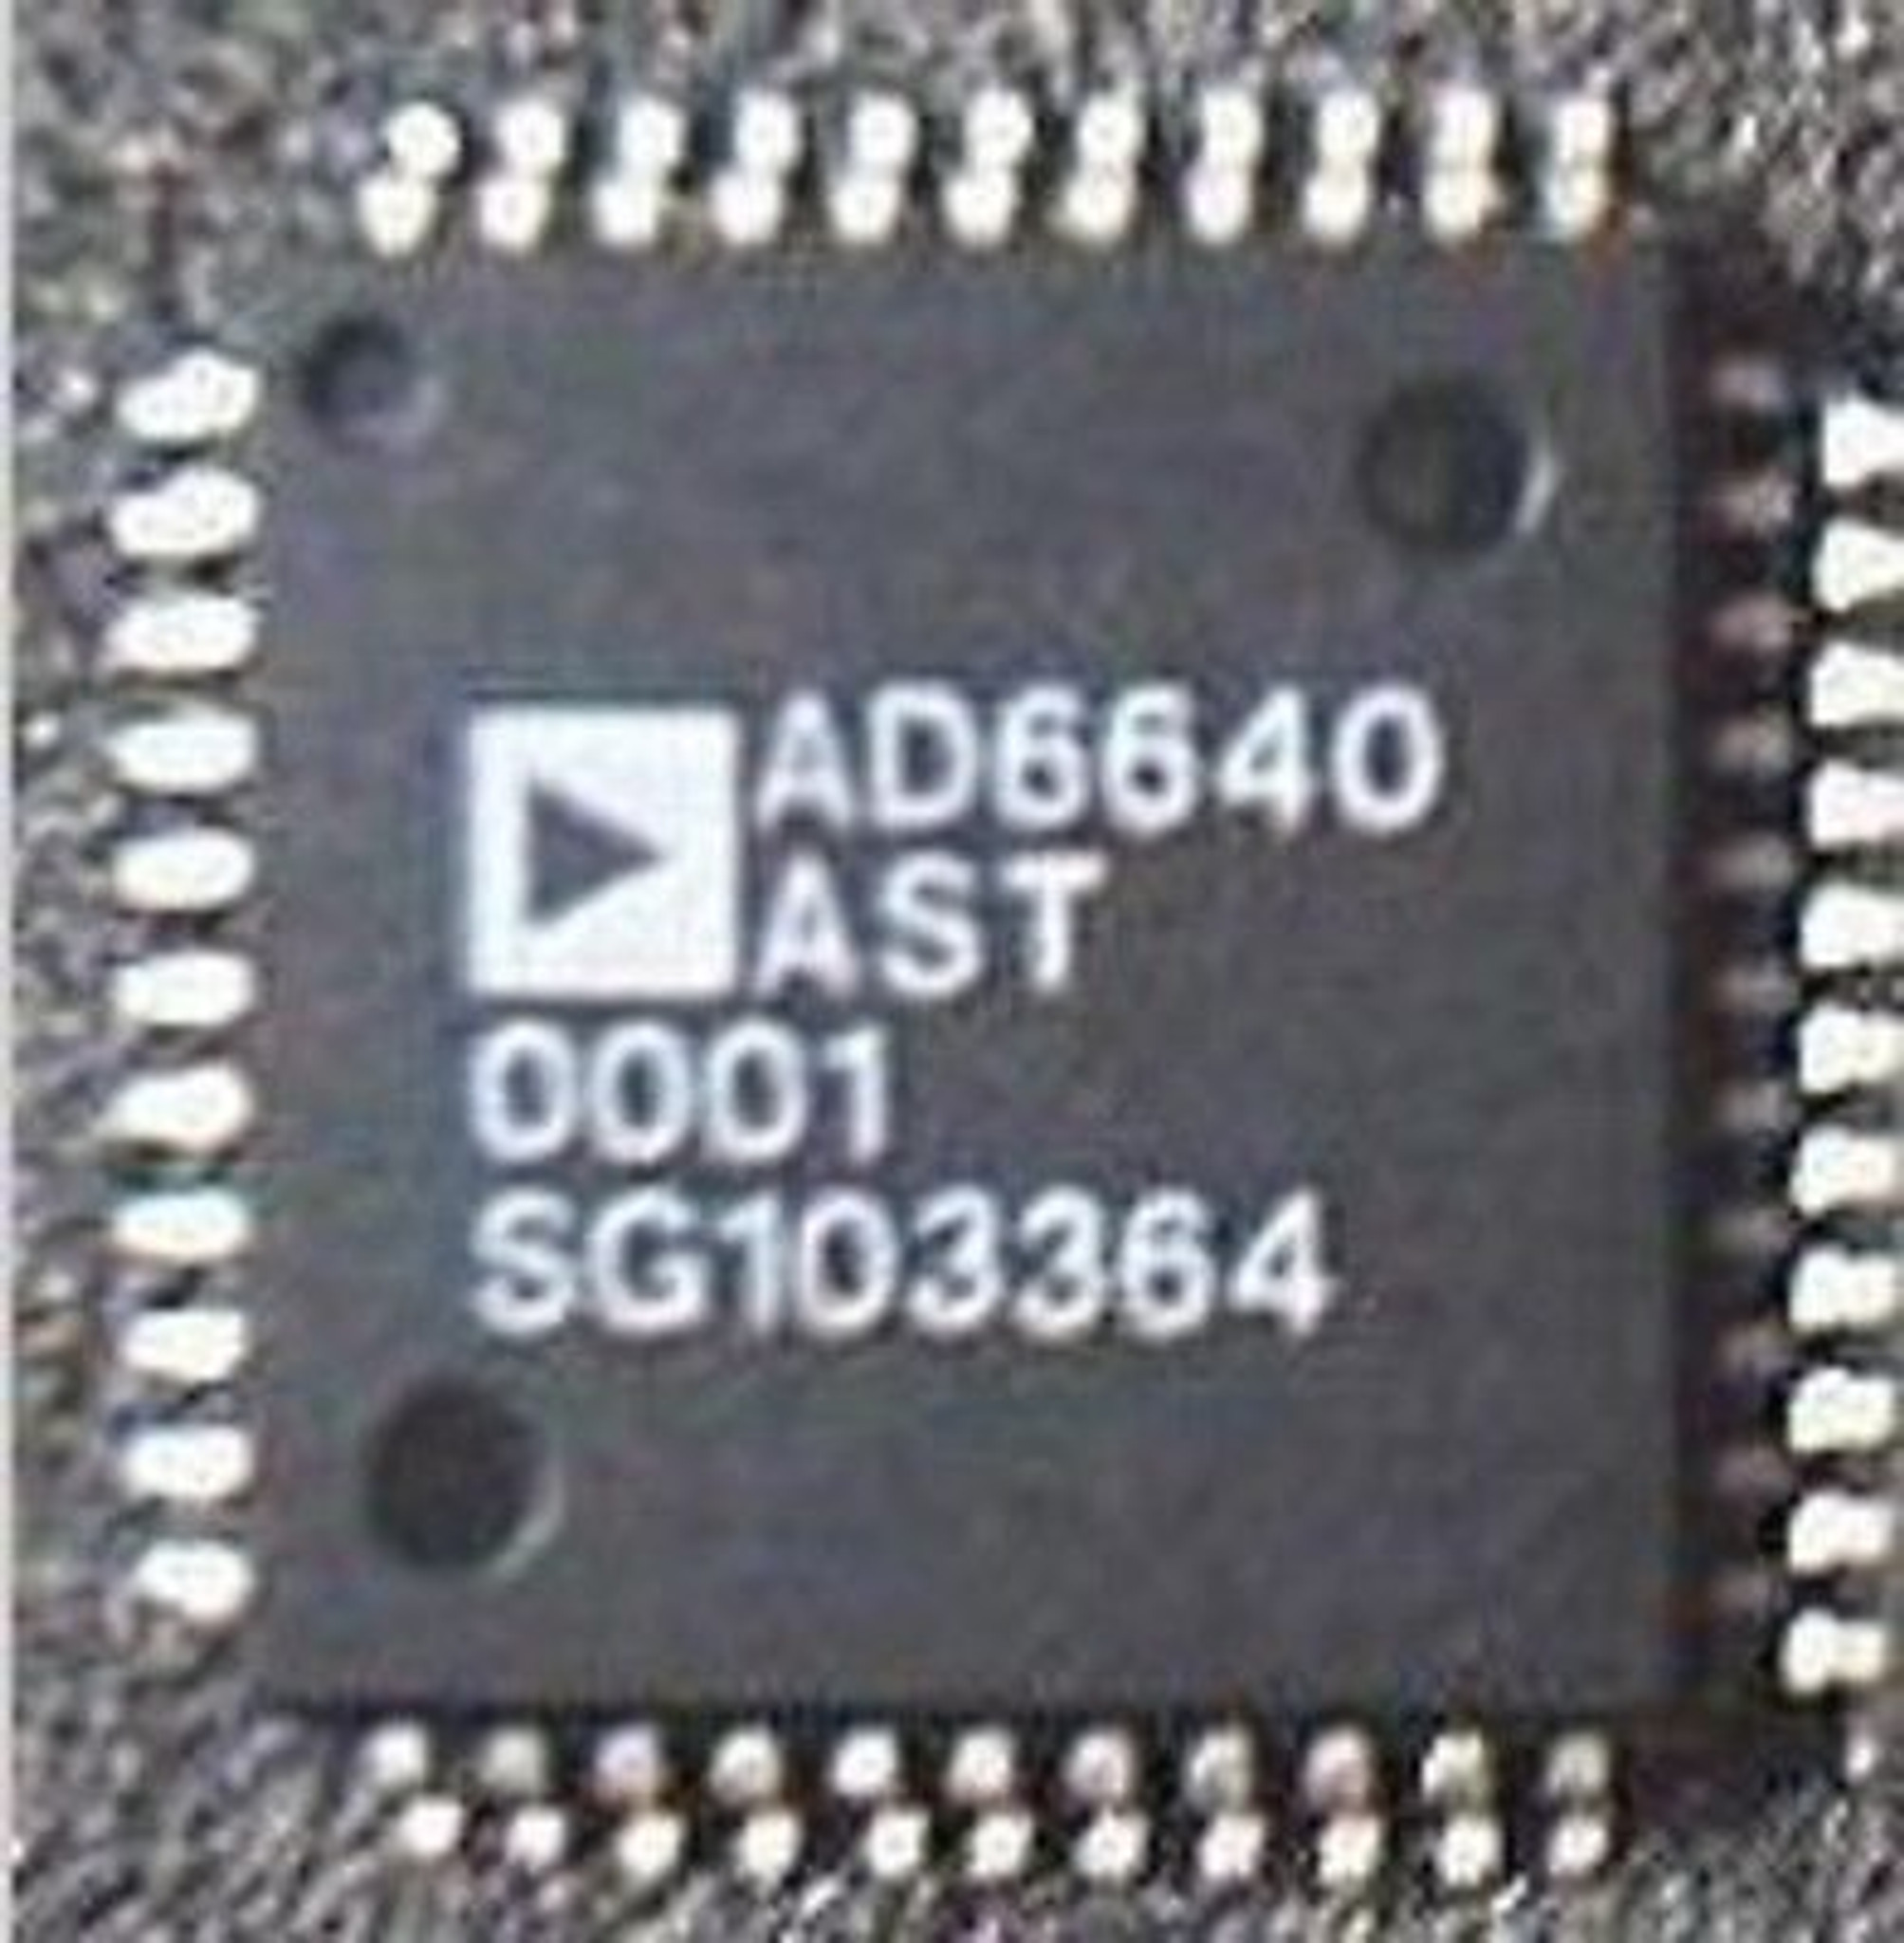 44 IC Single ADC pipeliné 65 Msps 12-bit parallèle 1x AD AD6640AST LQFP